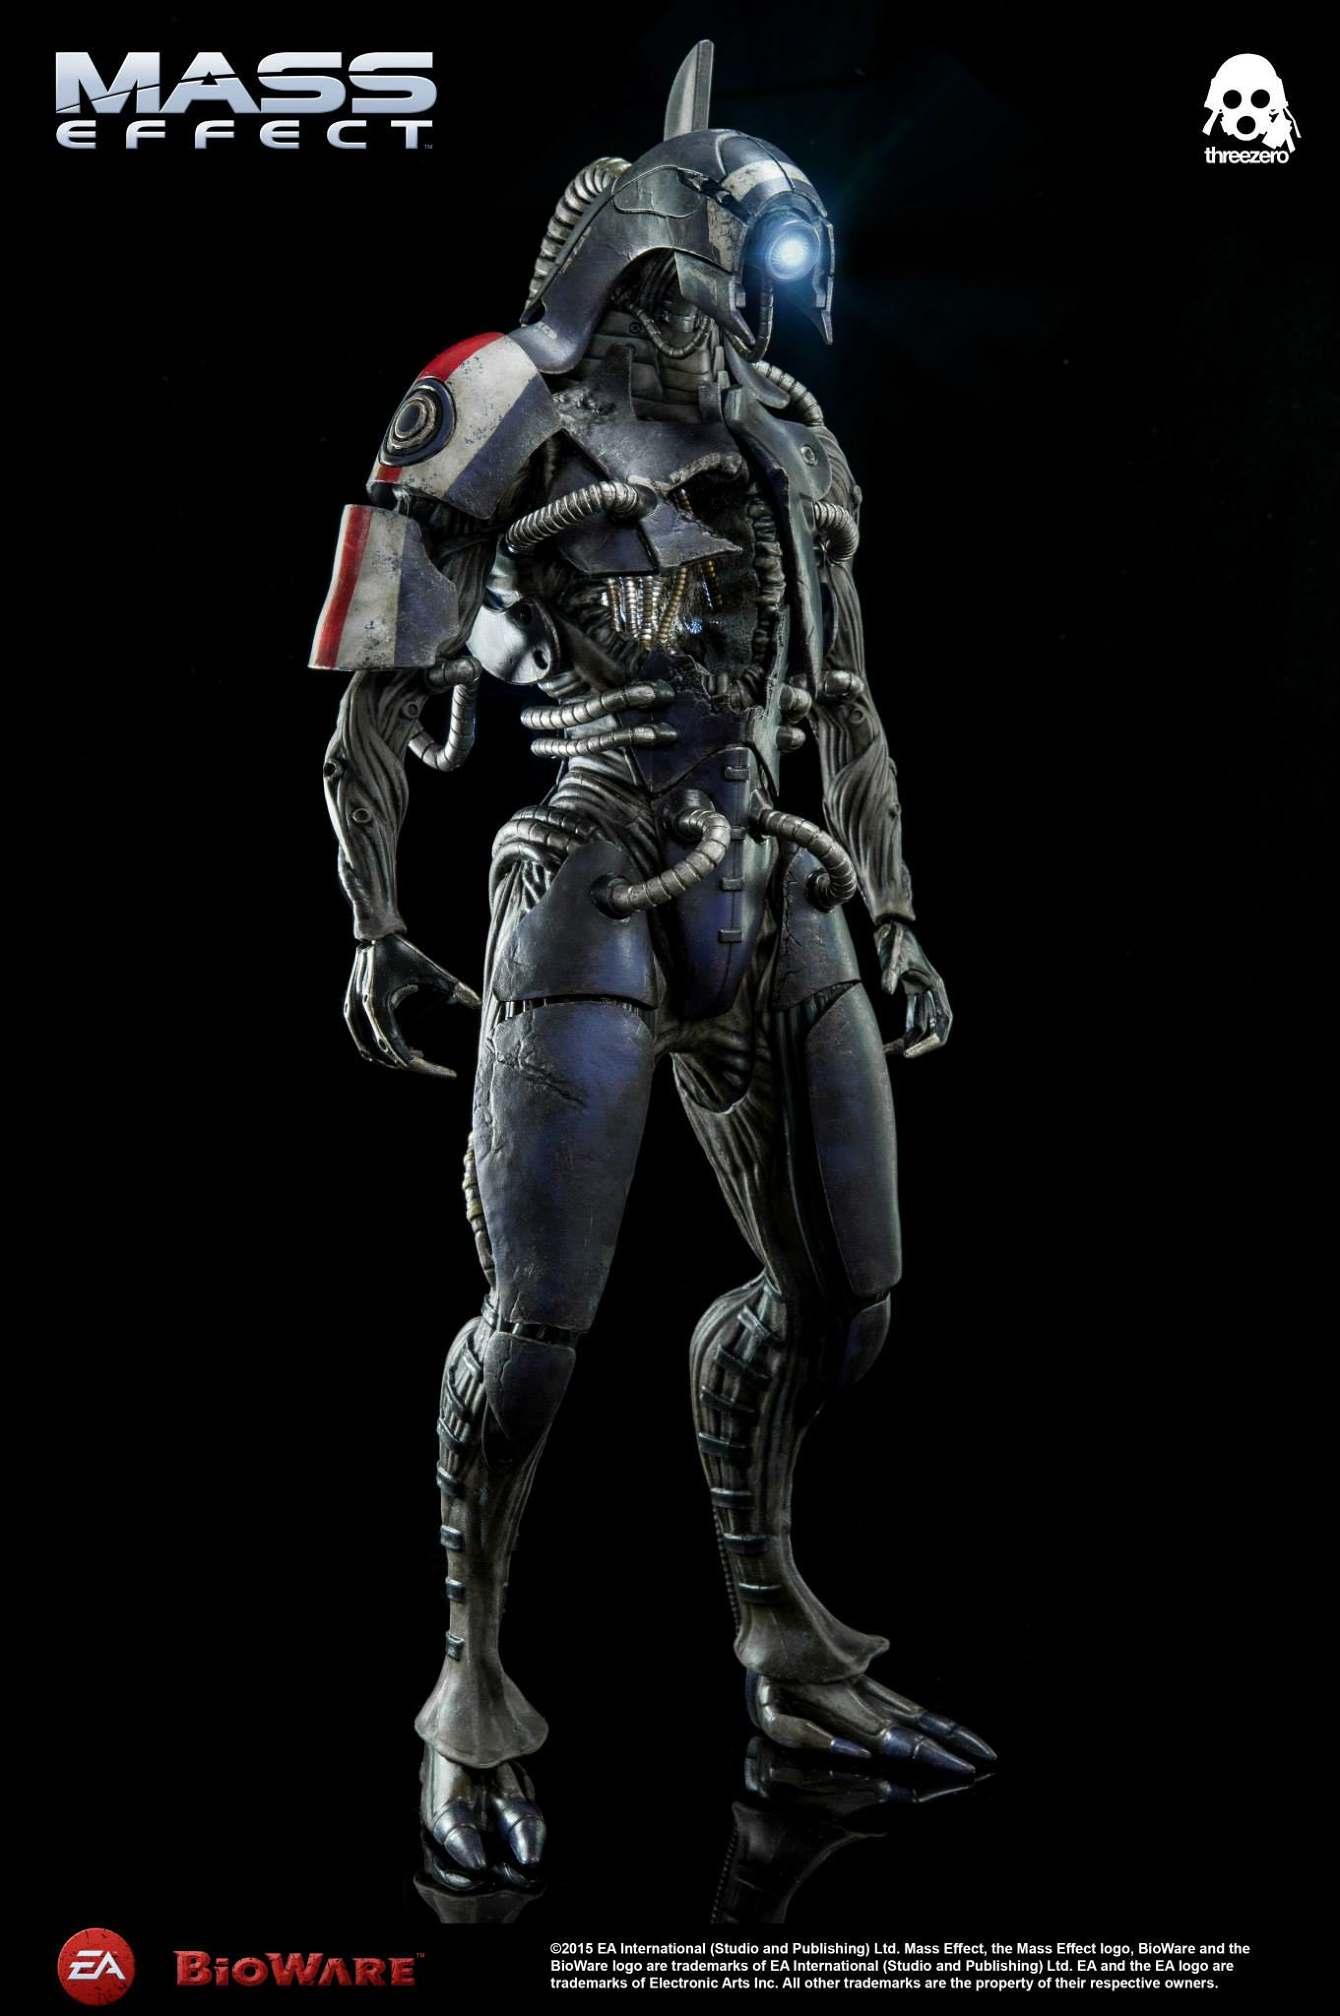 ThreeZero-Bioware-video-game-Legion-Mass-Effect-figure-12_1340_c.jpg